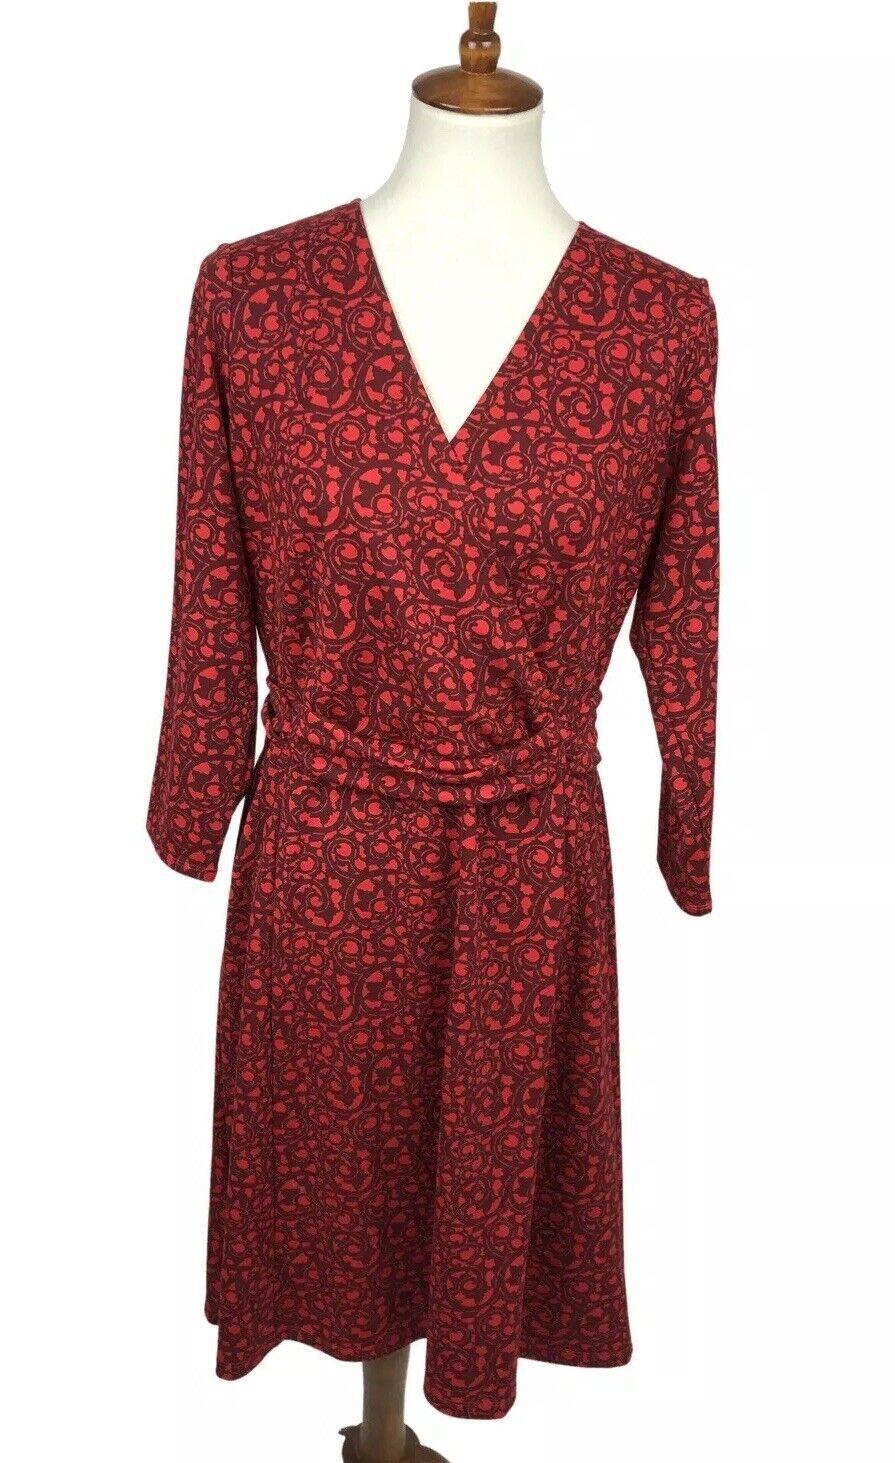 Lands' End Women's Size M 10 12 Knit Floral Faux Wrap Belted Dress Sheath Red